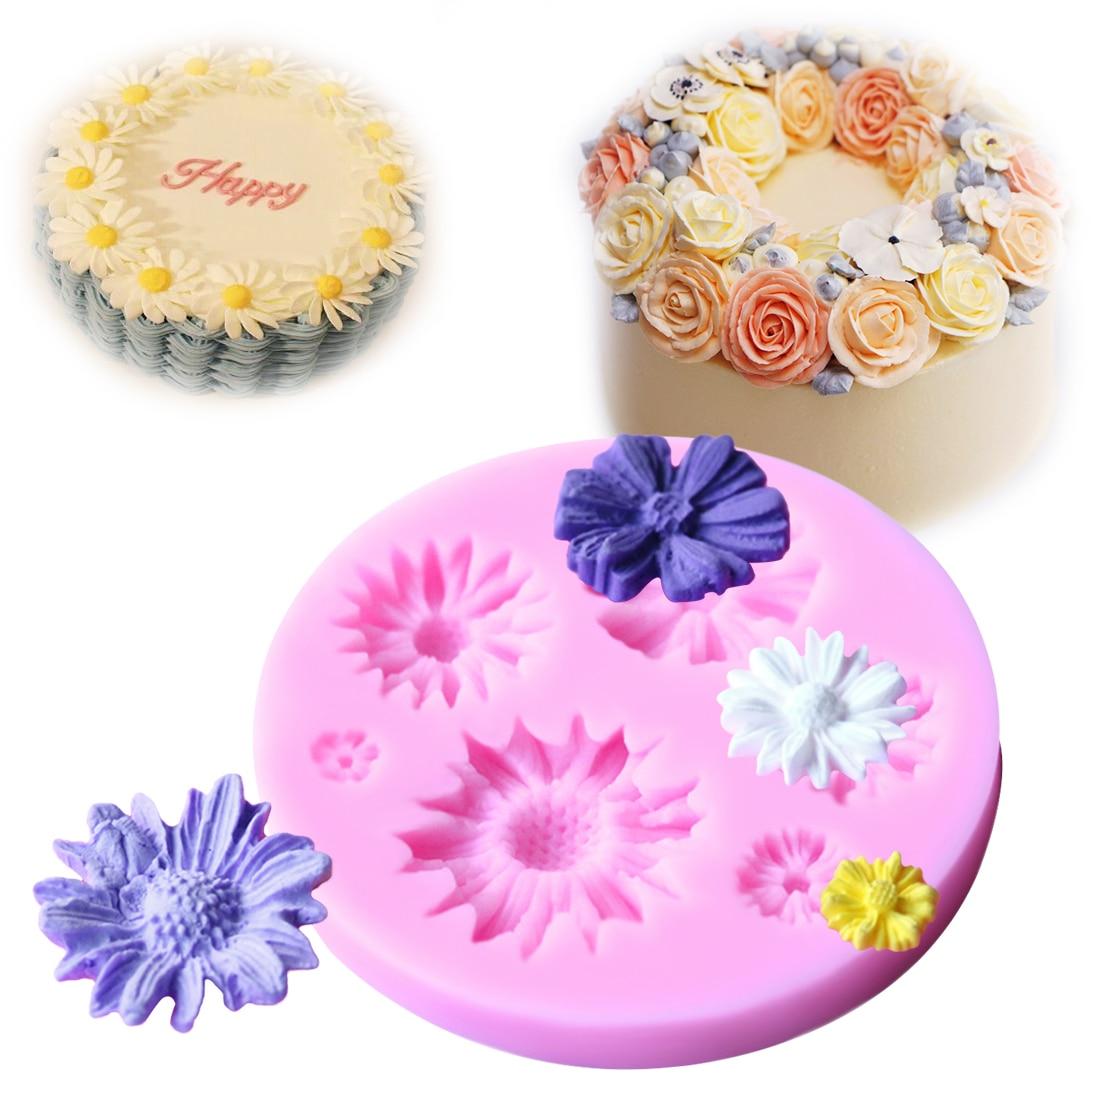 Flower Leaf Baking Cake Mold Kitchen Pastry Fondant Chocolate Decorative Tool De